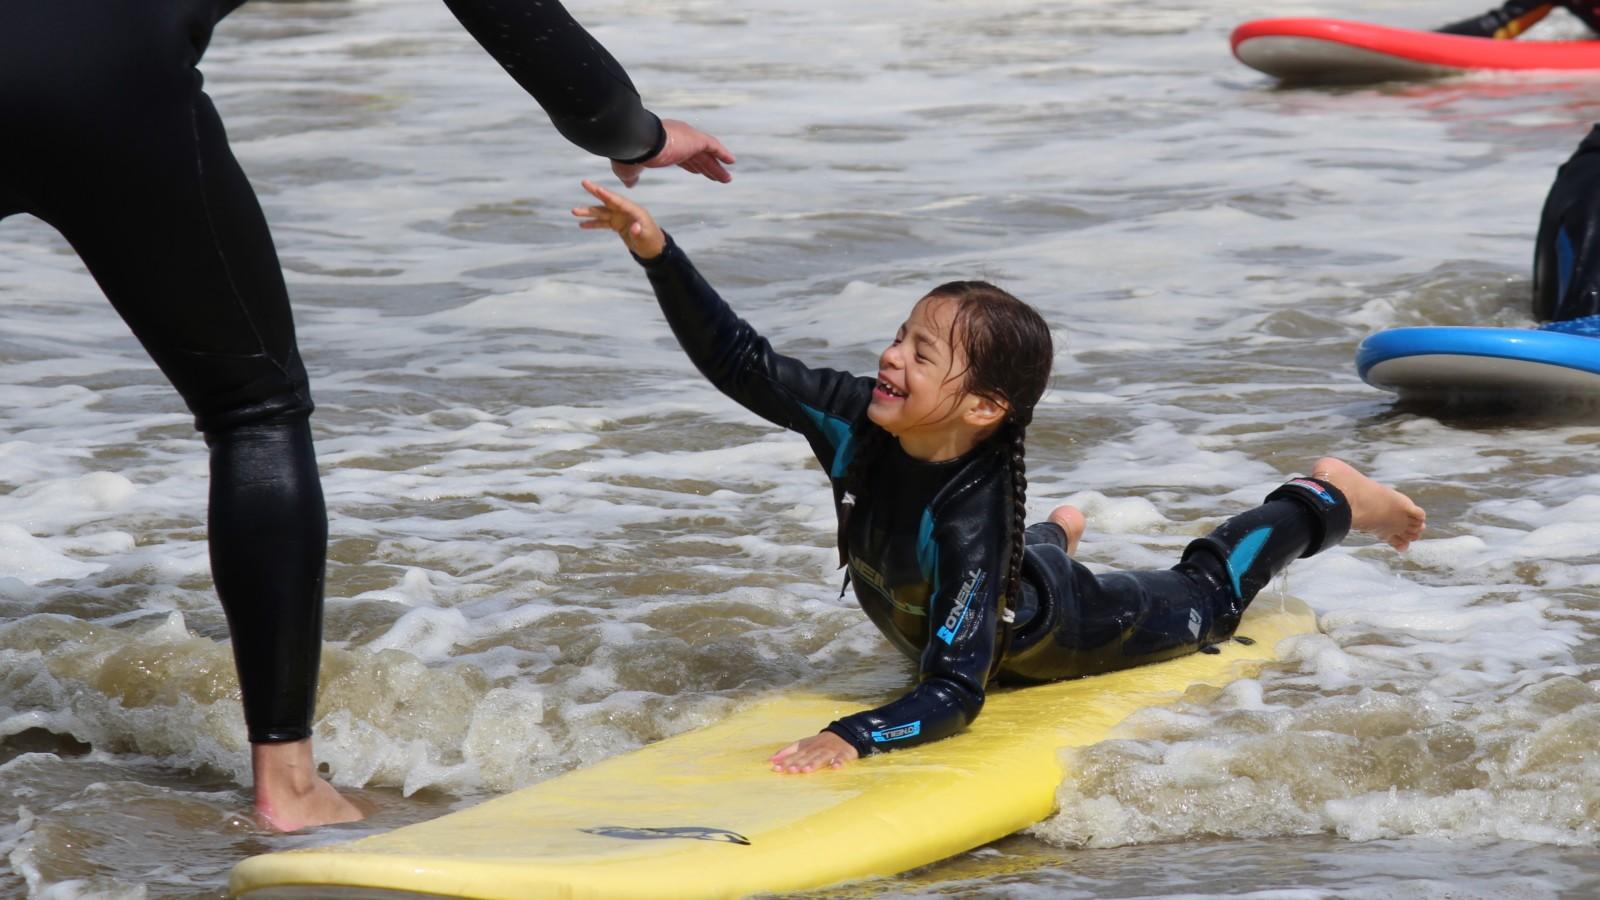 Surfkamp Scheveningen zomerkamp